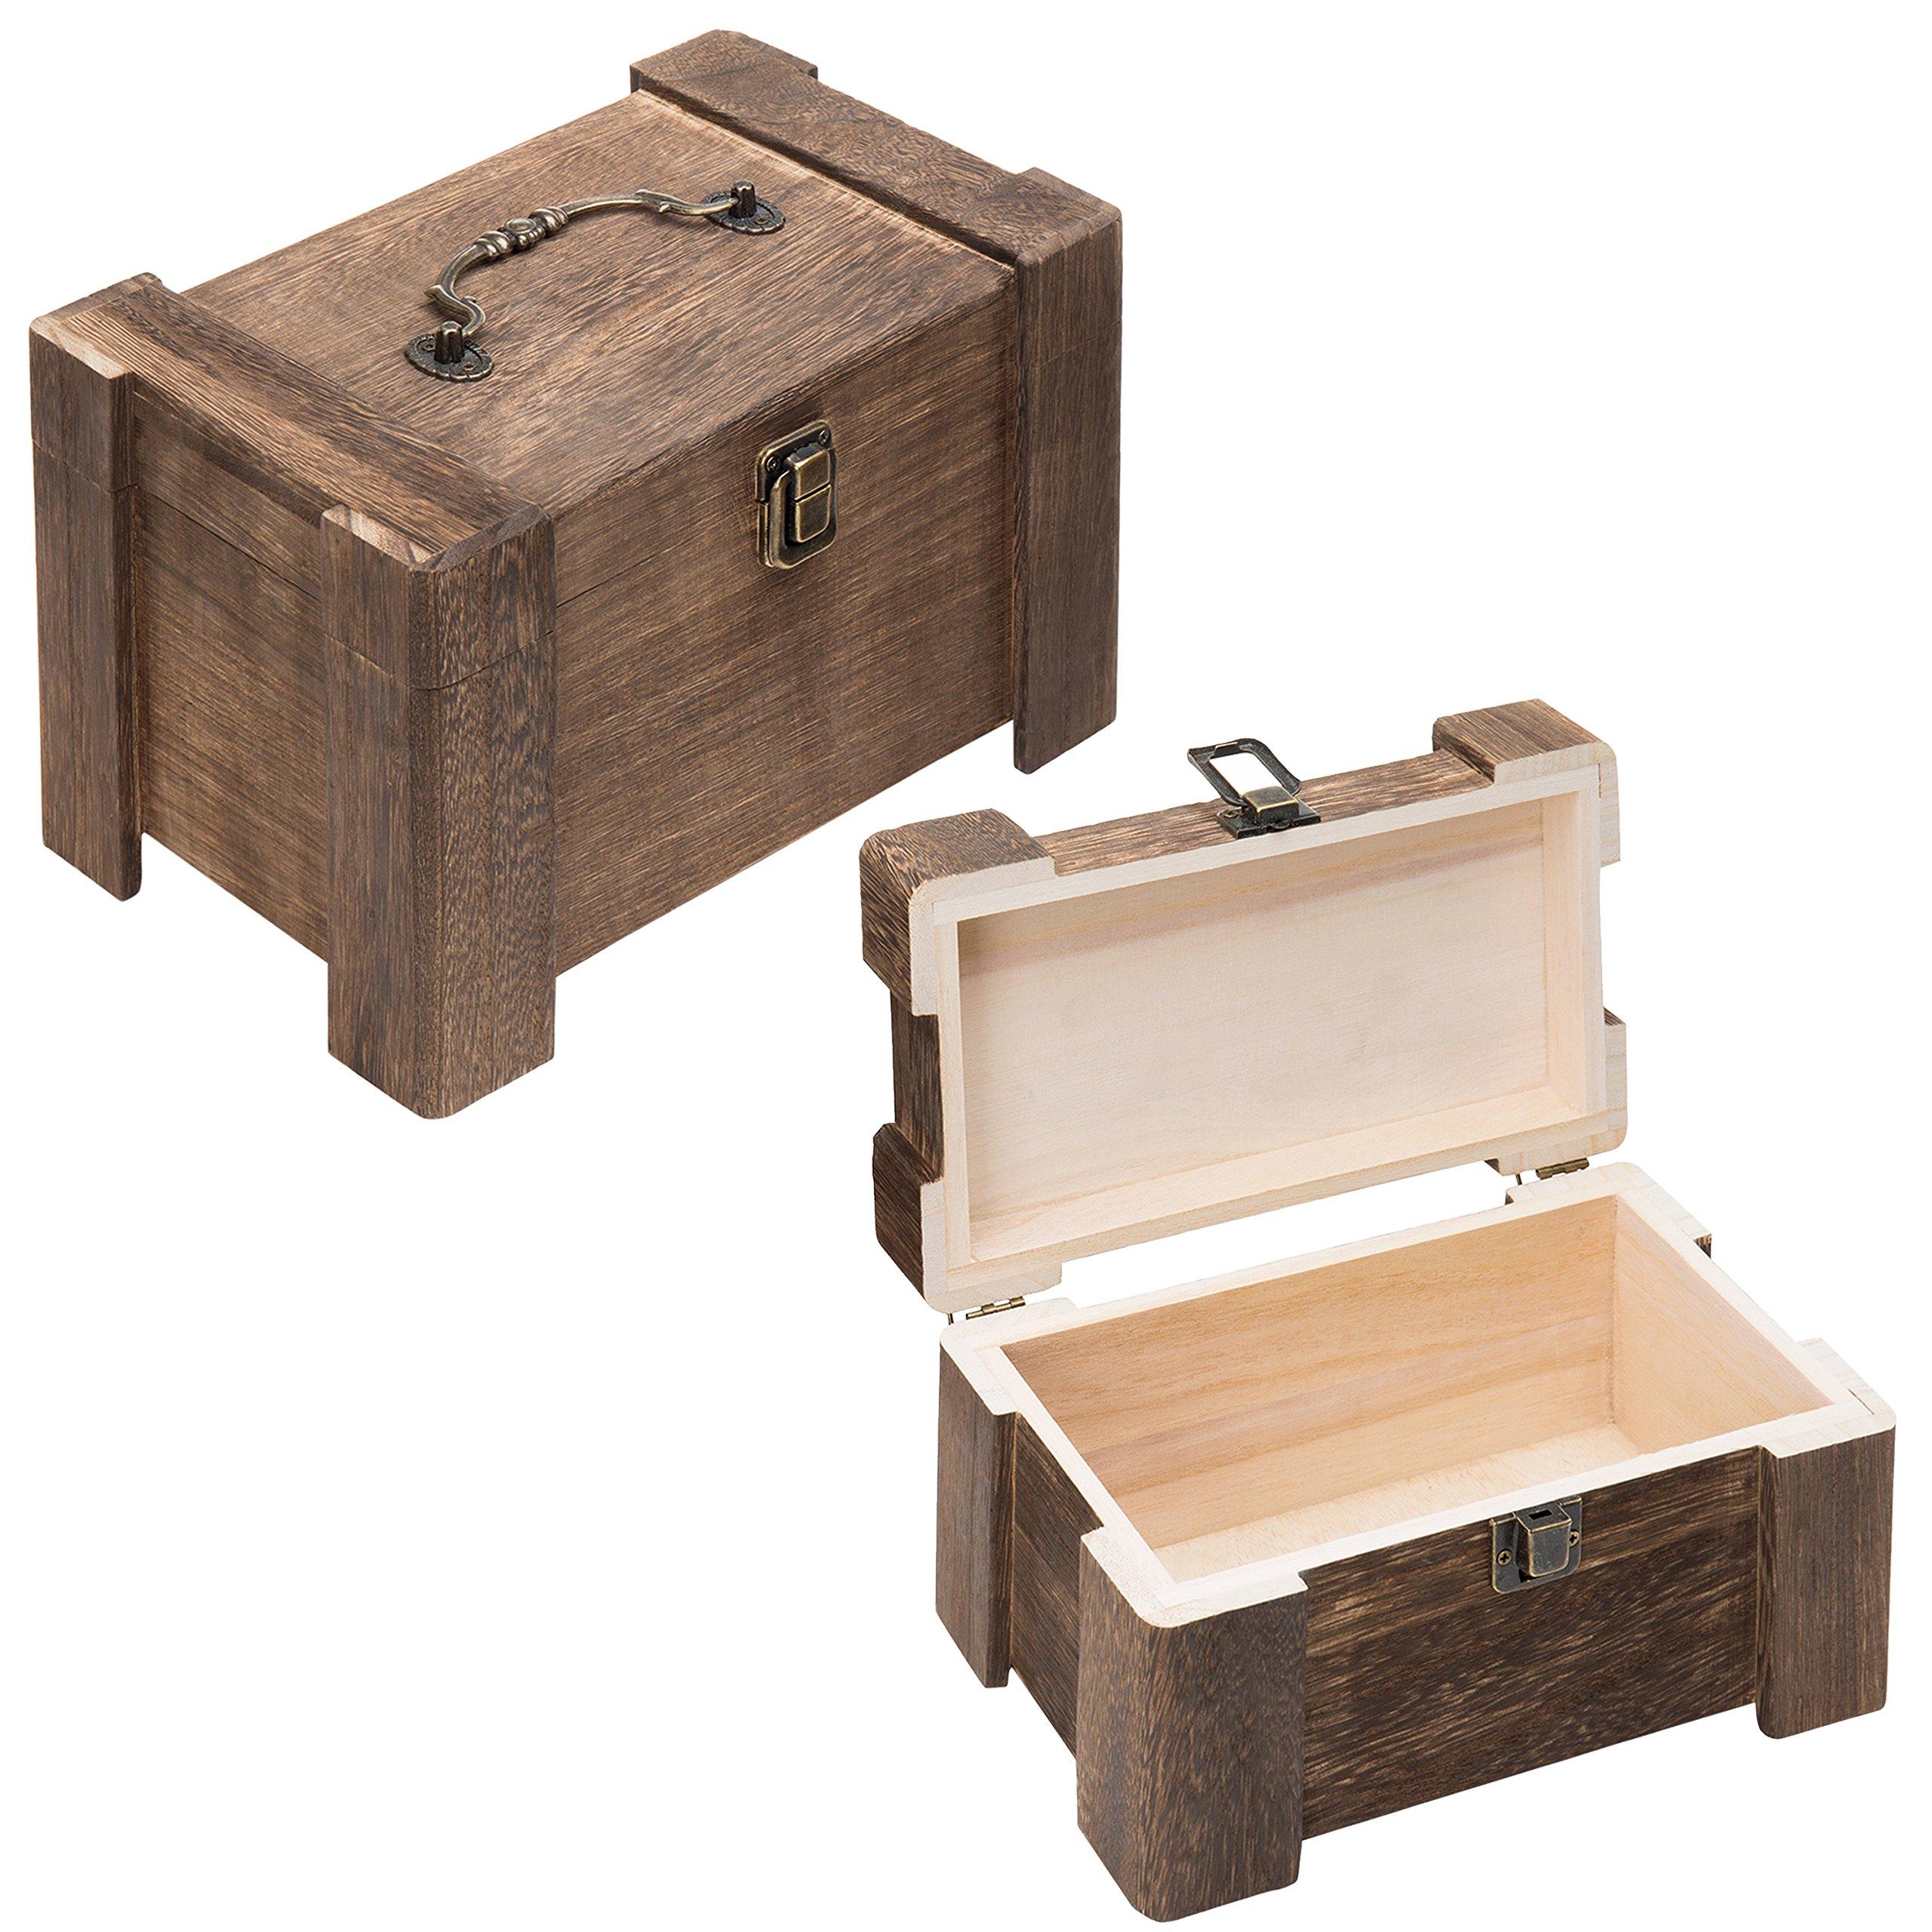 MyGift Decorative Wooden Vintage-Style Keepsake Storage Chests, Set of 2